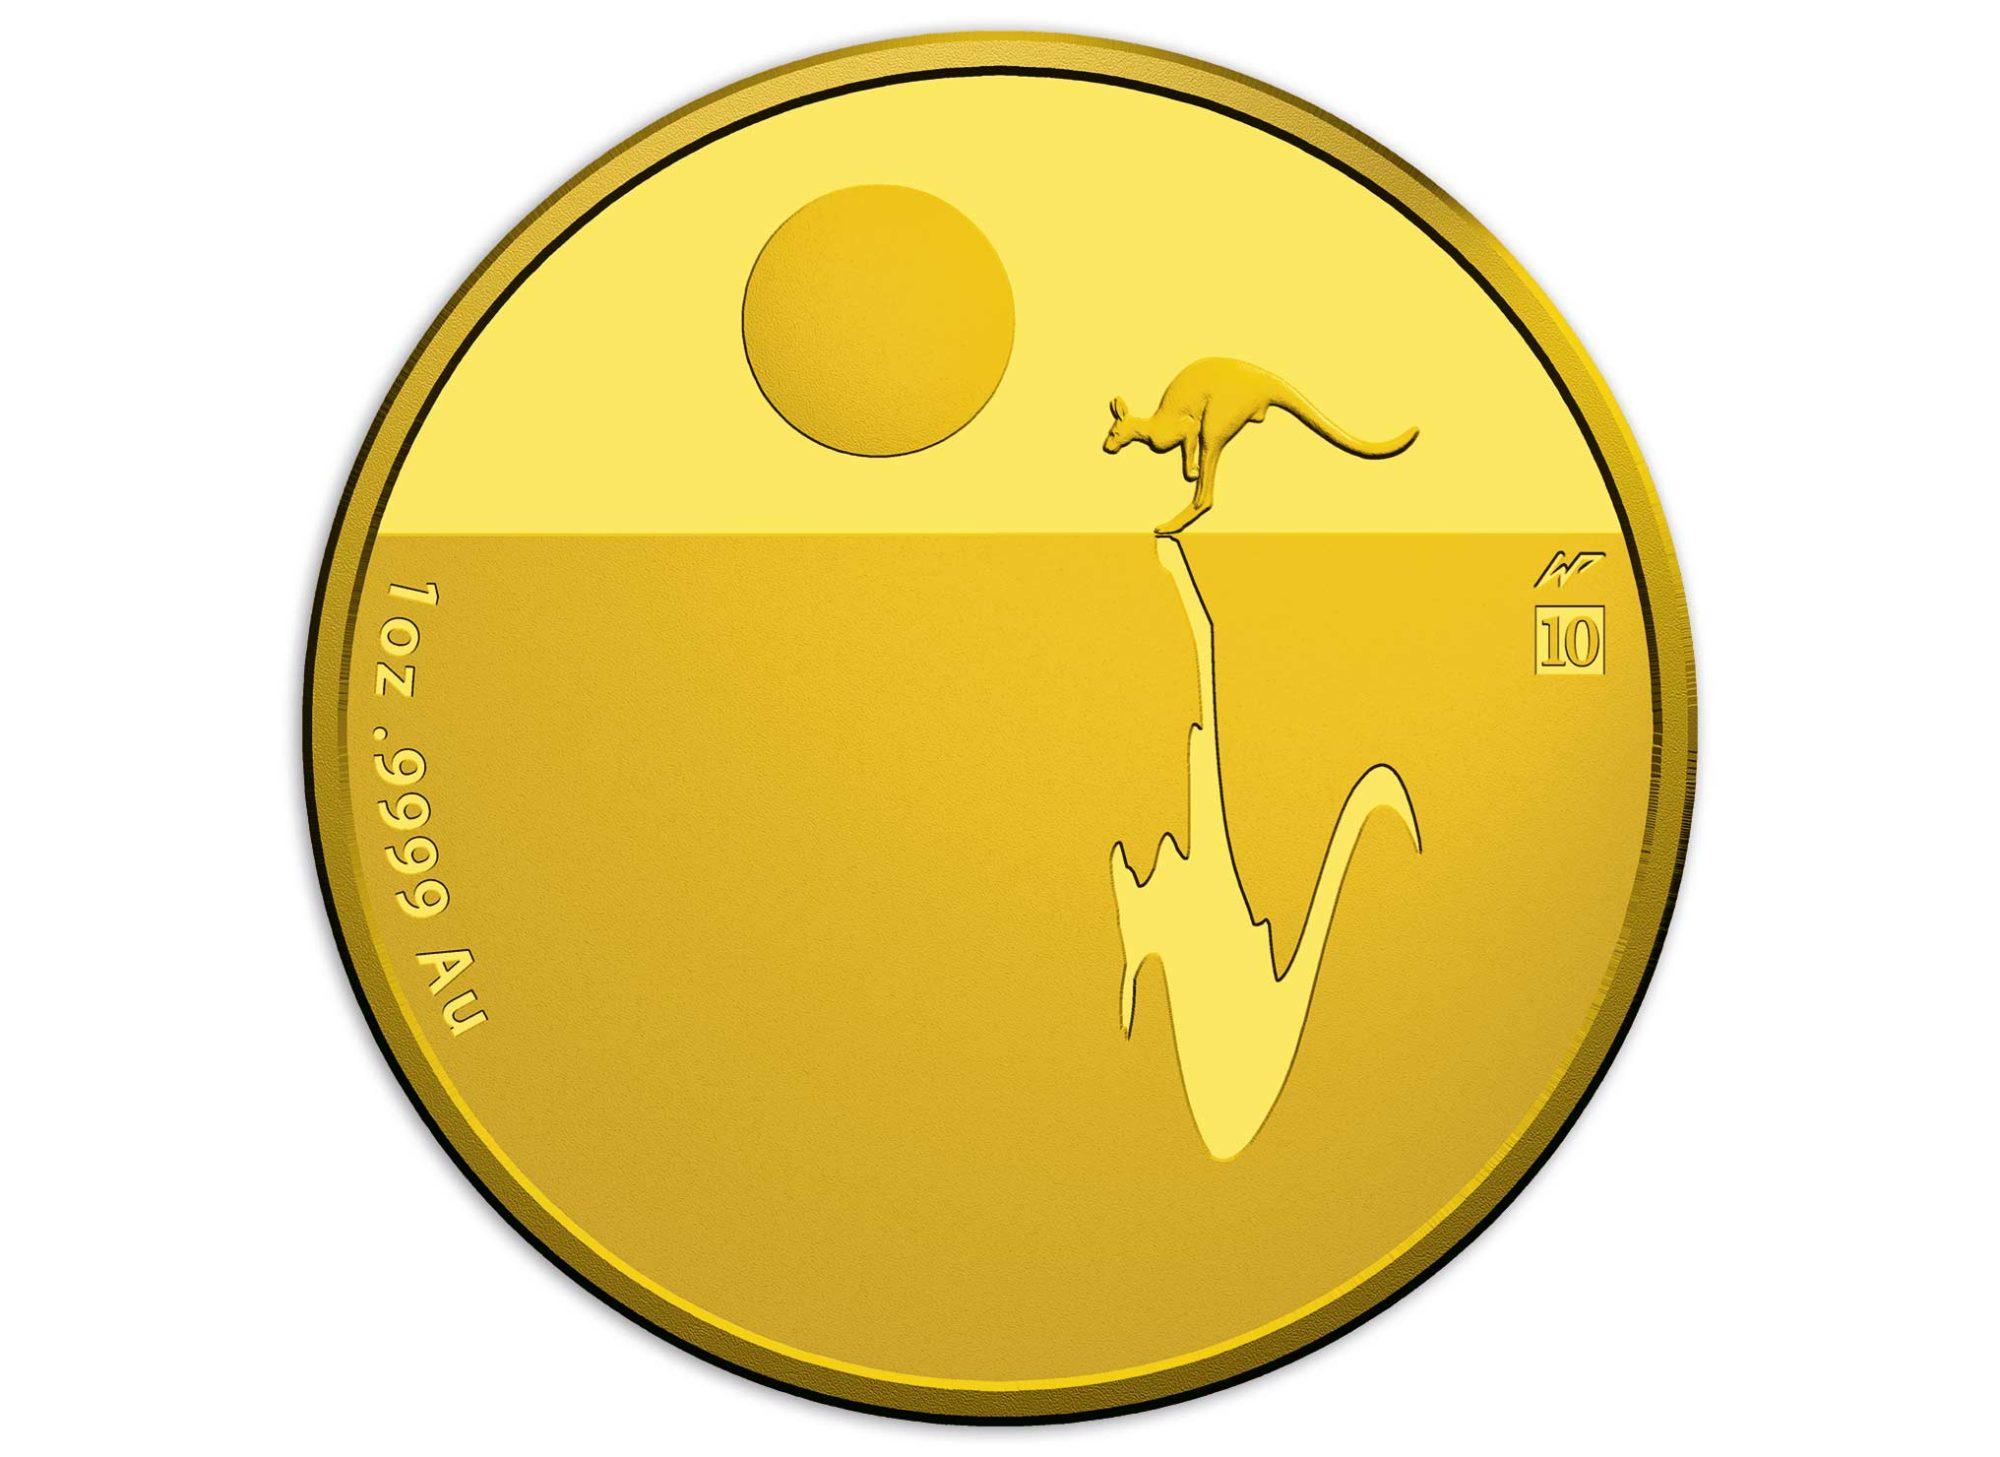 Känguru Goldmünze — Sunset Kangaroo 2017 1oz Gold — Begehrte Goldmünze